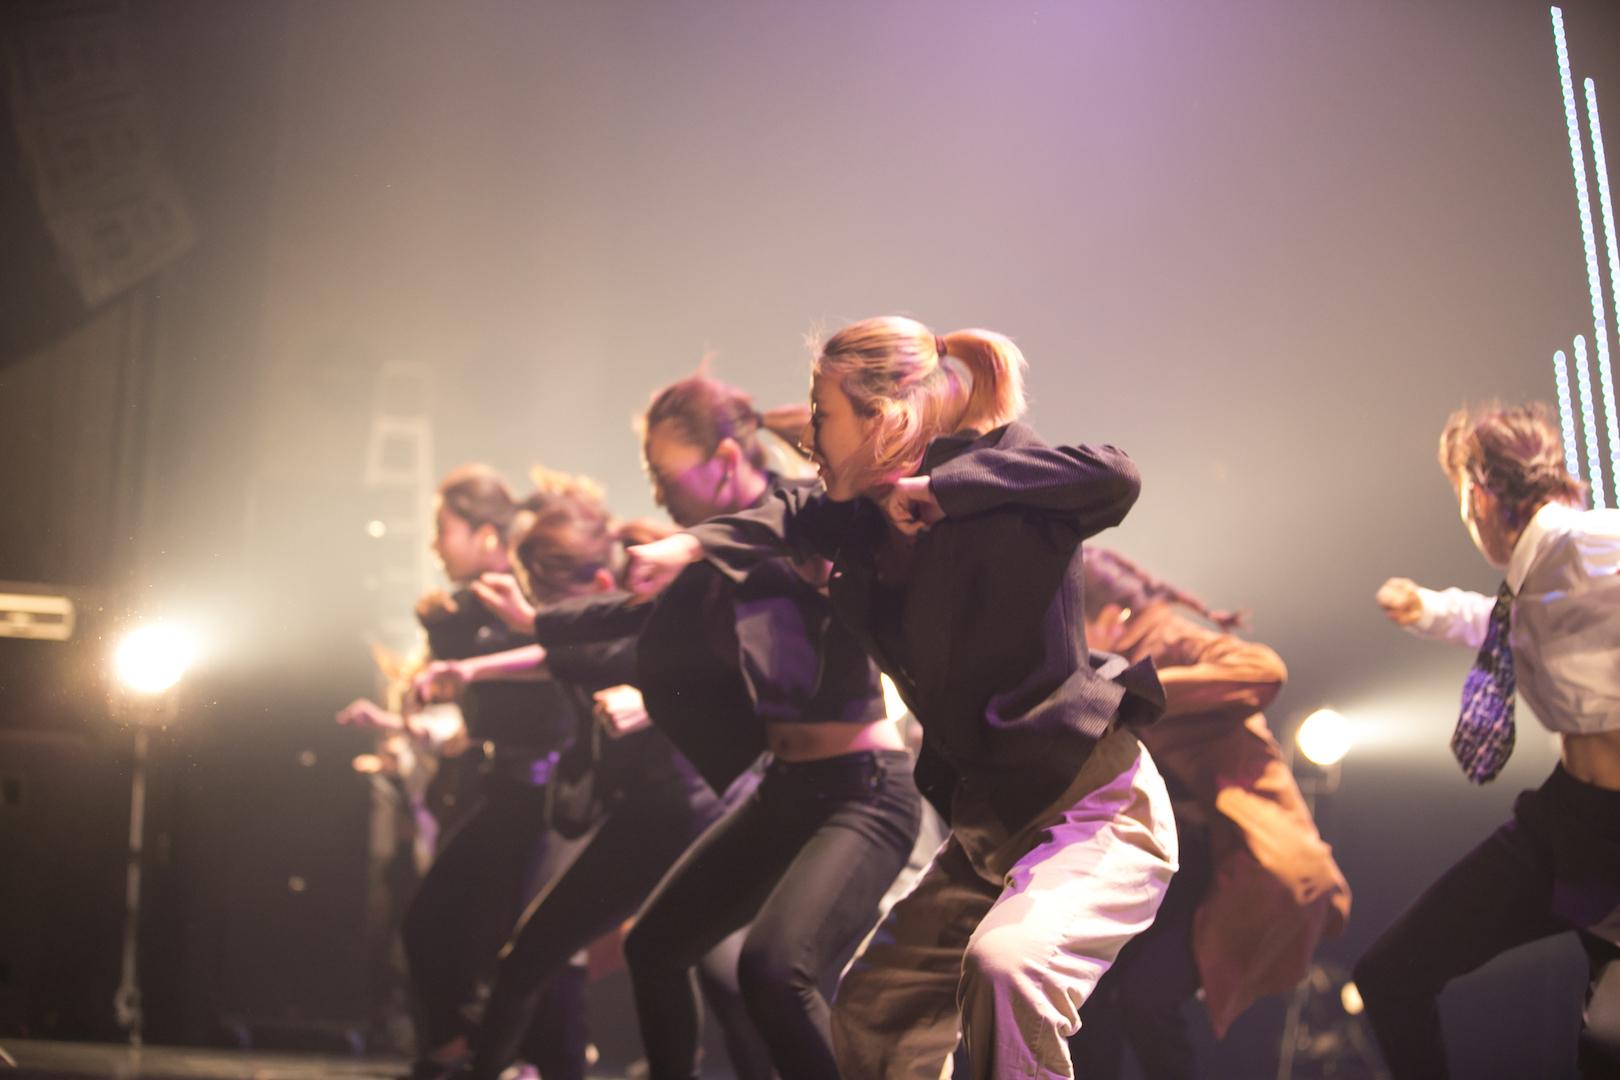 「Japan Dancers' Championship」 写真提供:Vintom